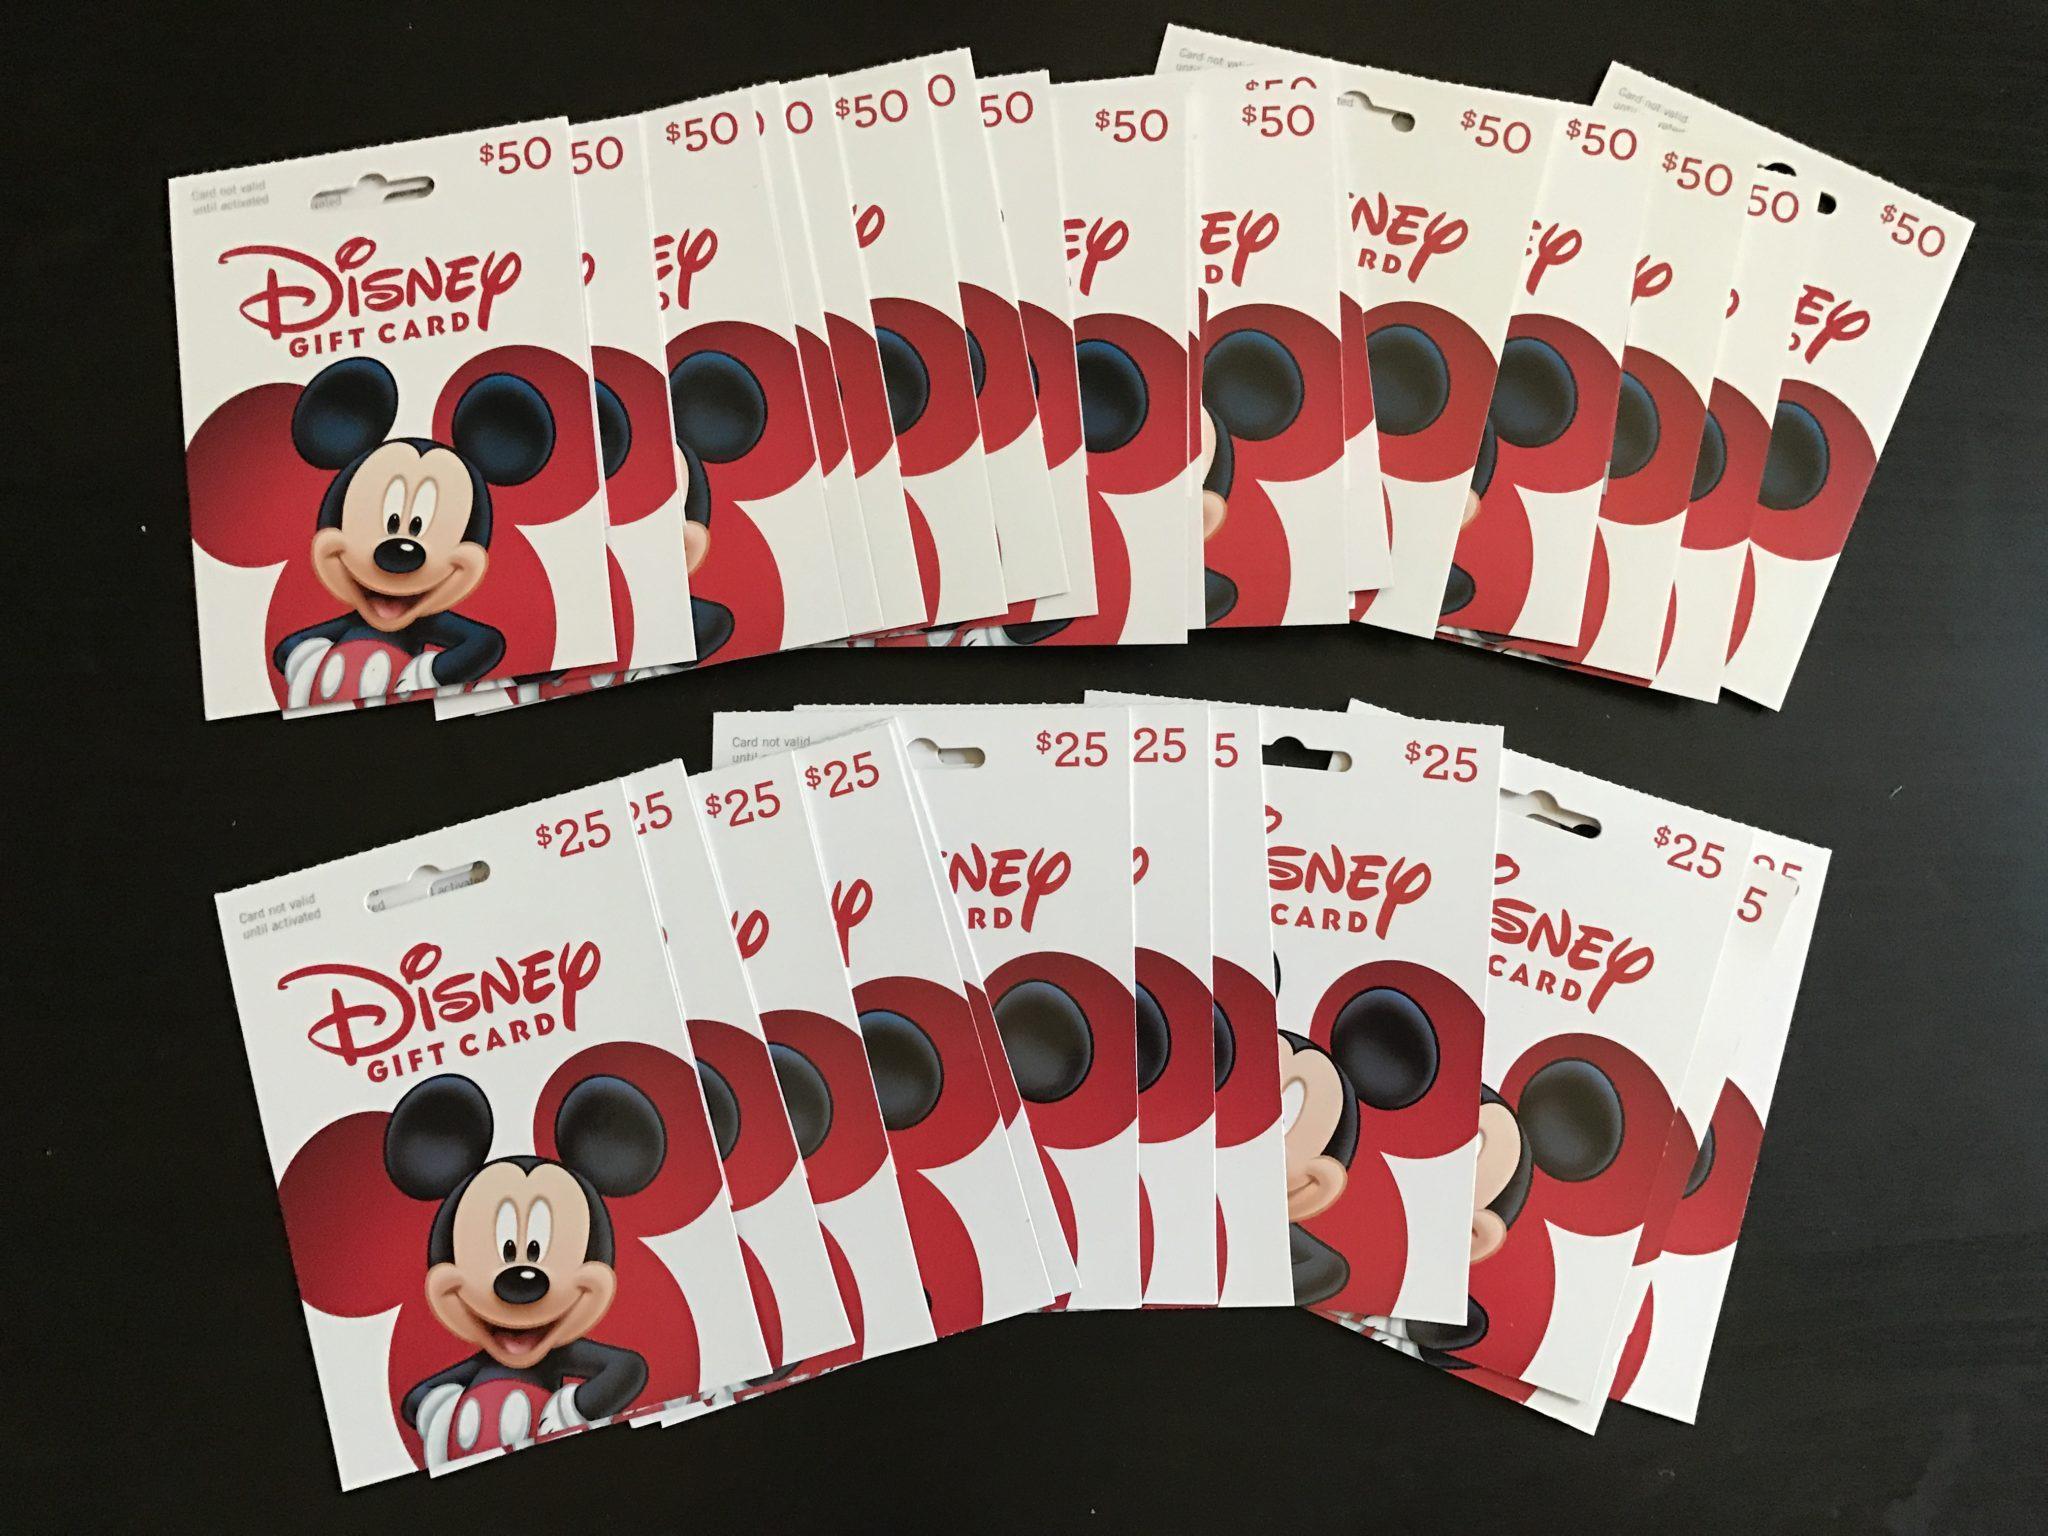 Buy Disney Gift Cards at Target